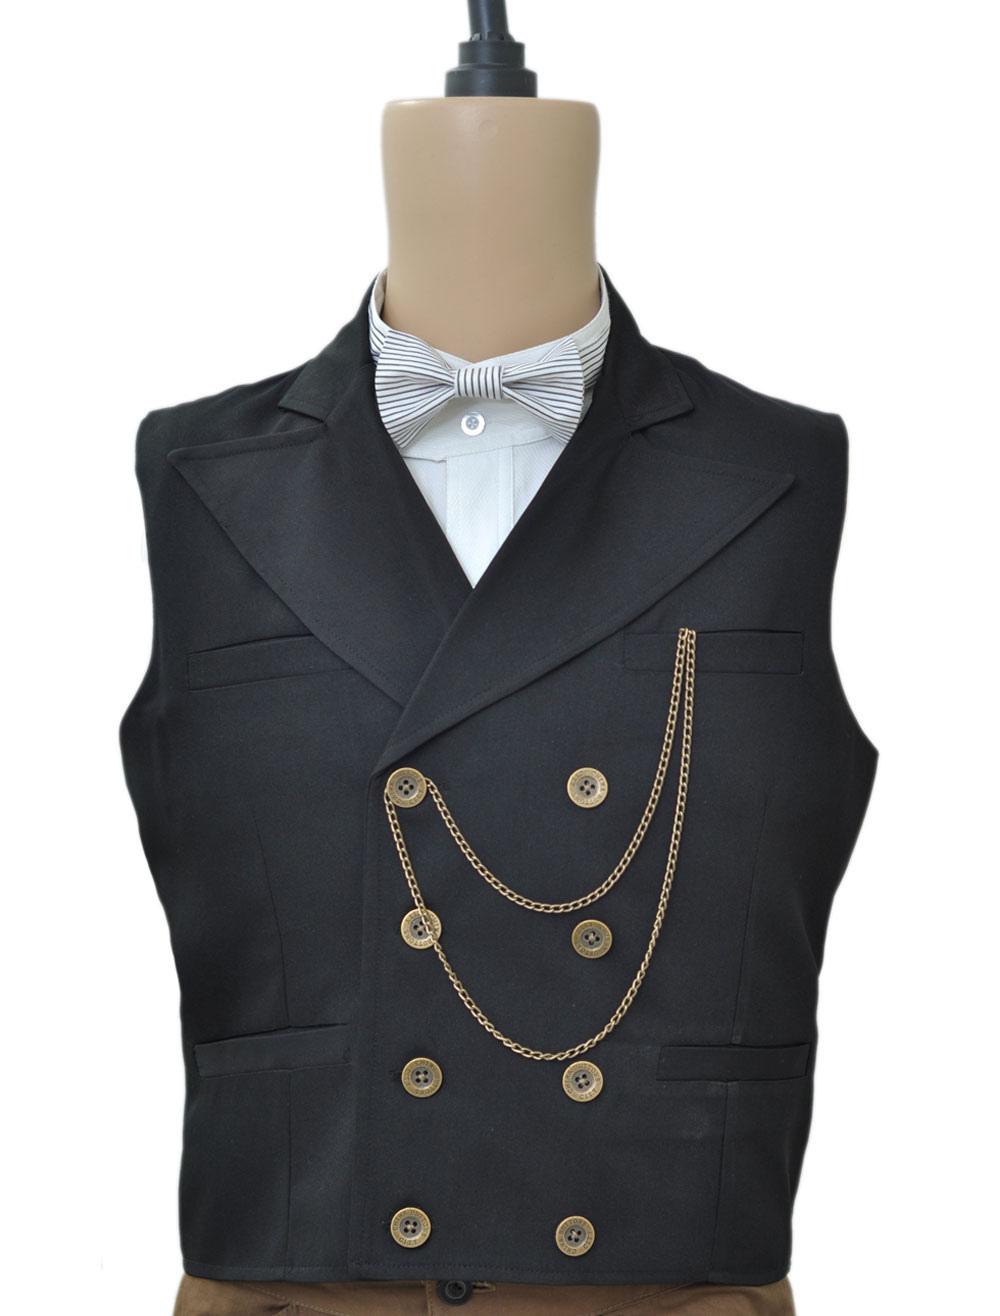 Black Steampunk Waistcoat